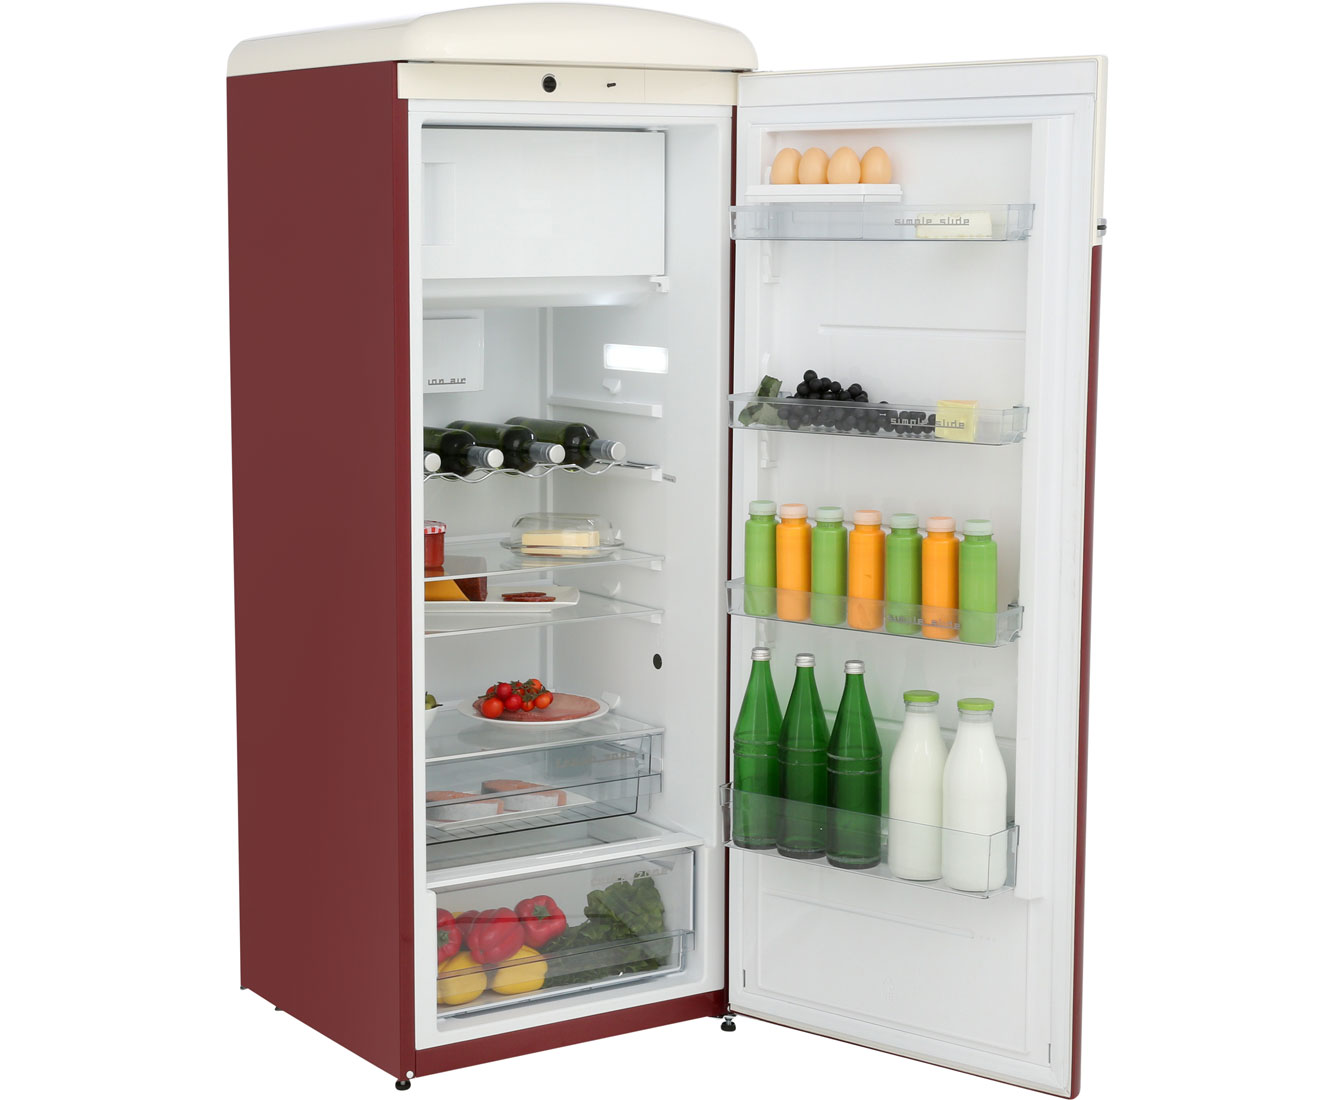 Gorenje Kühlschrank Bulli : Gorenje kühlschrank bulli kühlschrank obrb bl gorenje gorenje